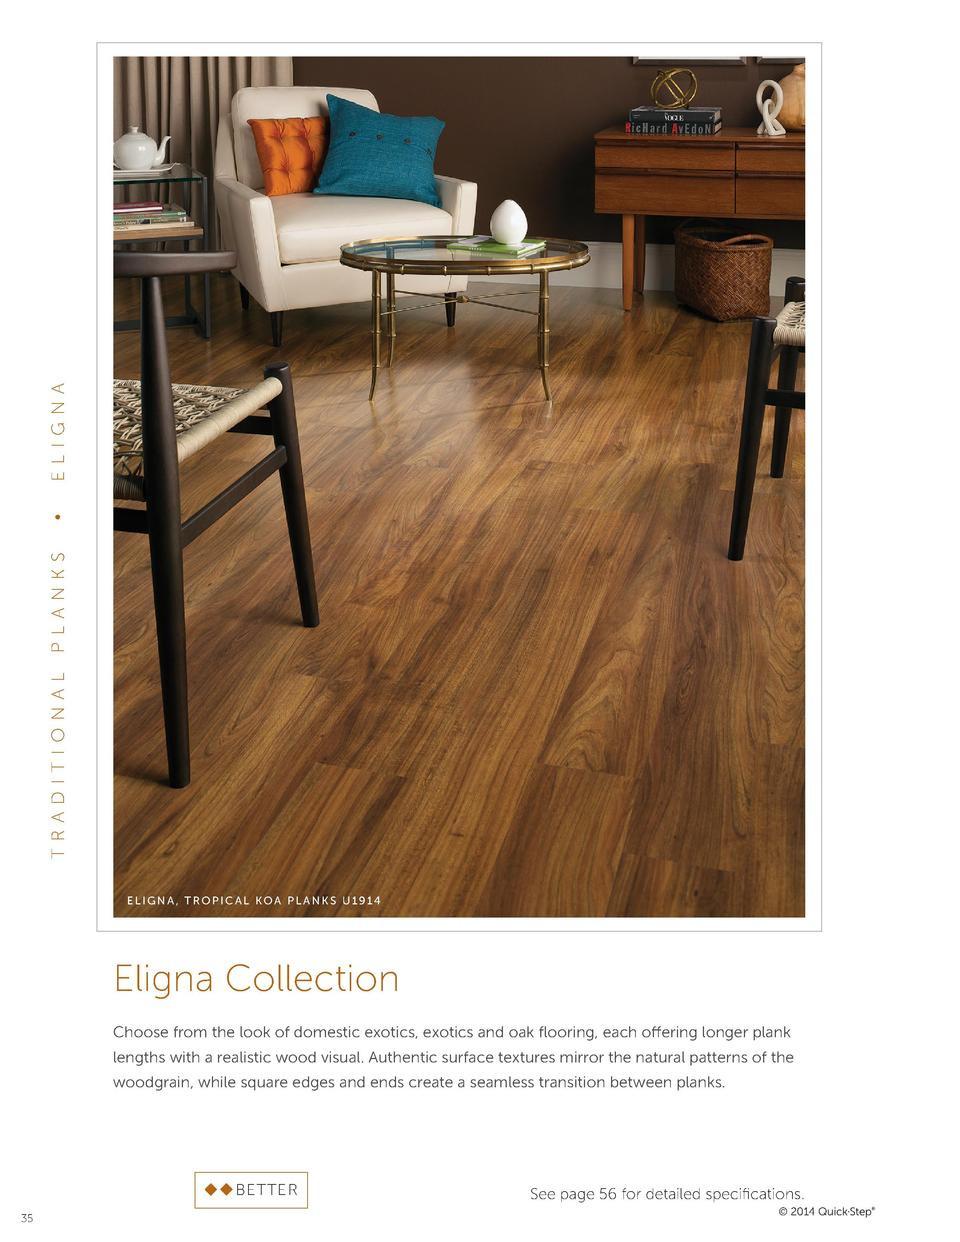 hardwood floor repair markers of quick step laminate catalog simplebooklet com with el ig n a p l a nks tr ad i t i ona l eligna tropical koa planks u1914 eligna